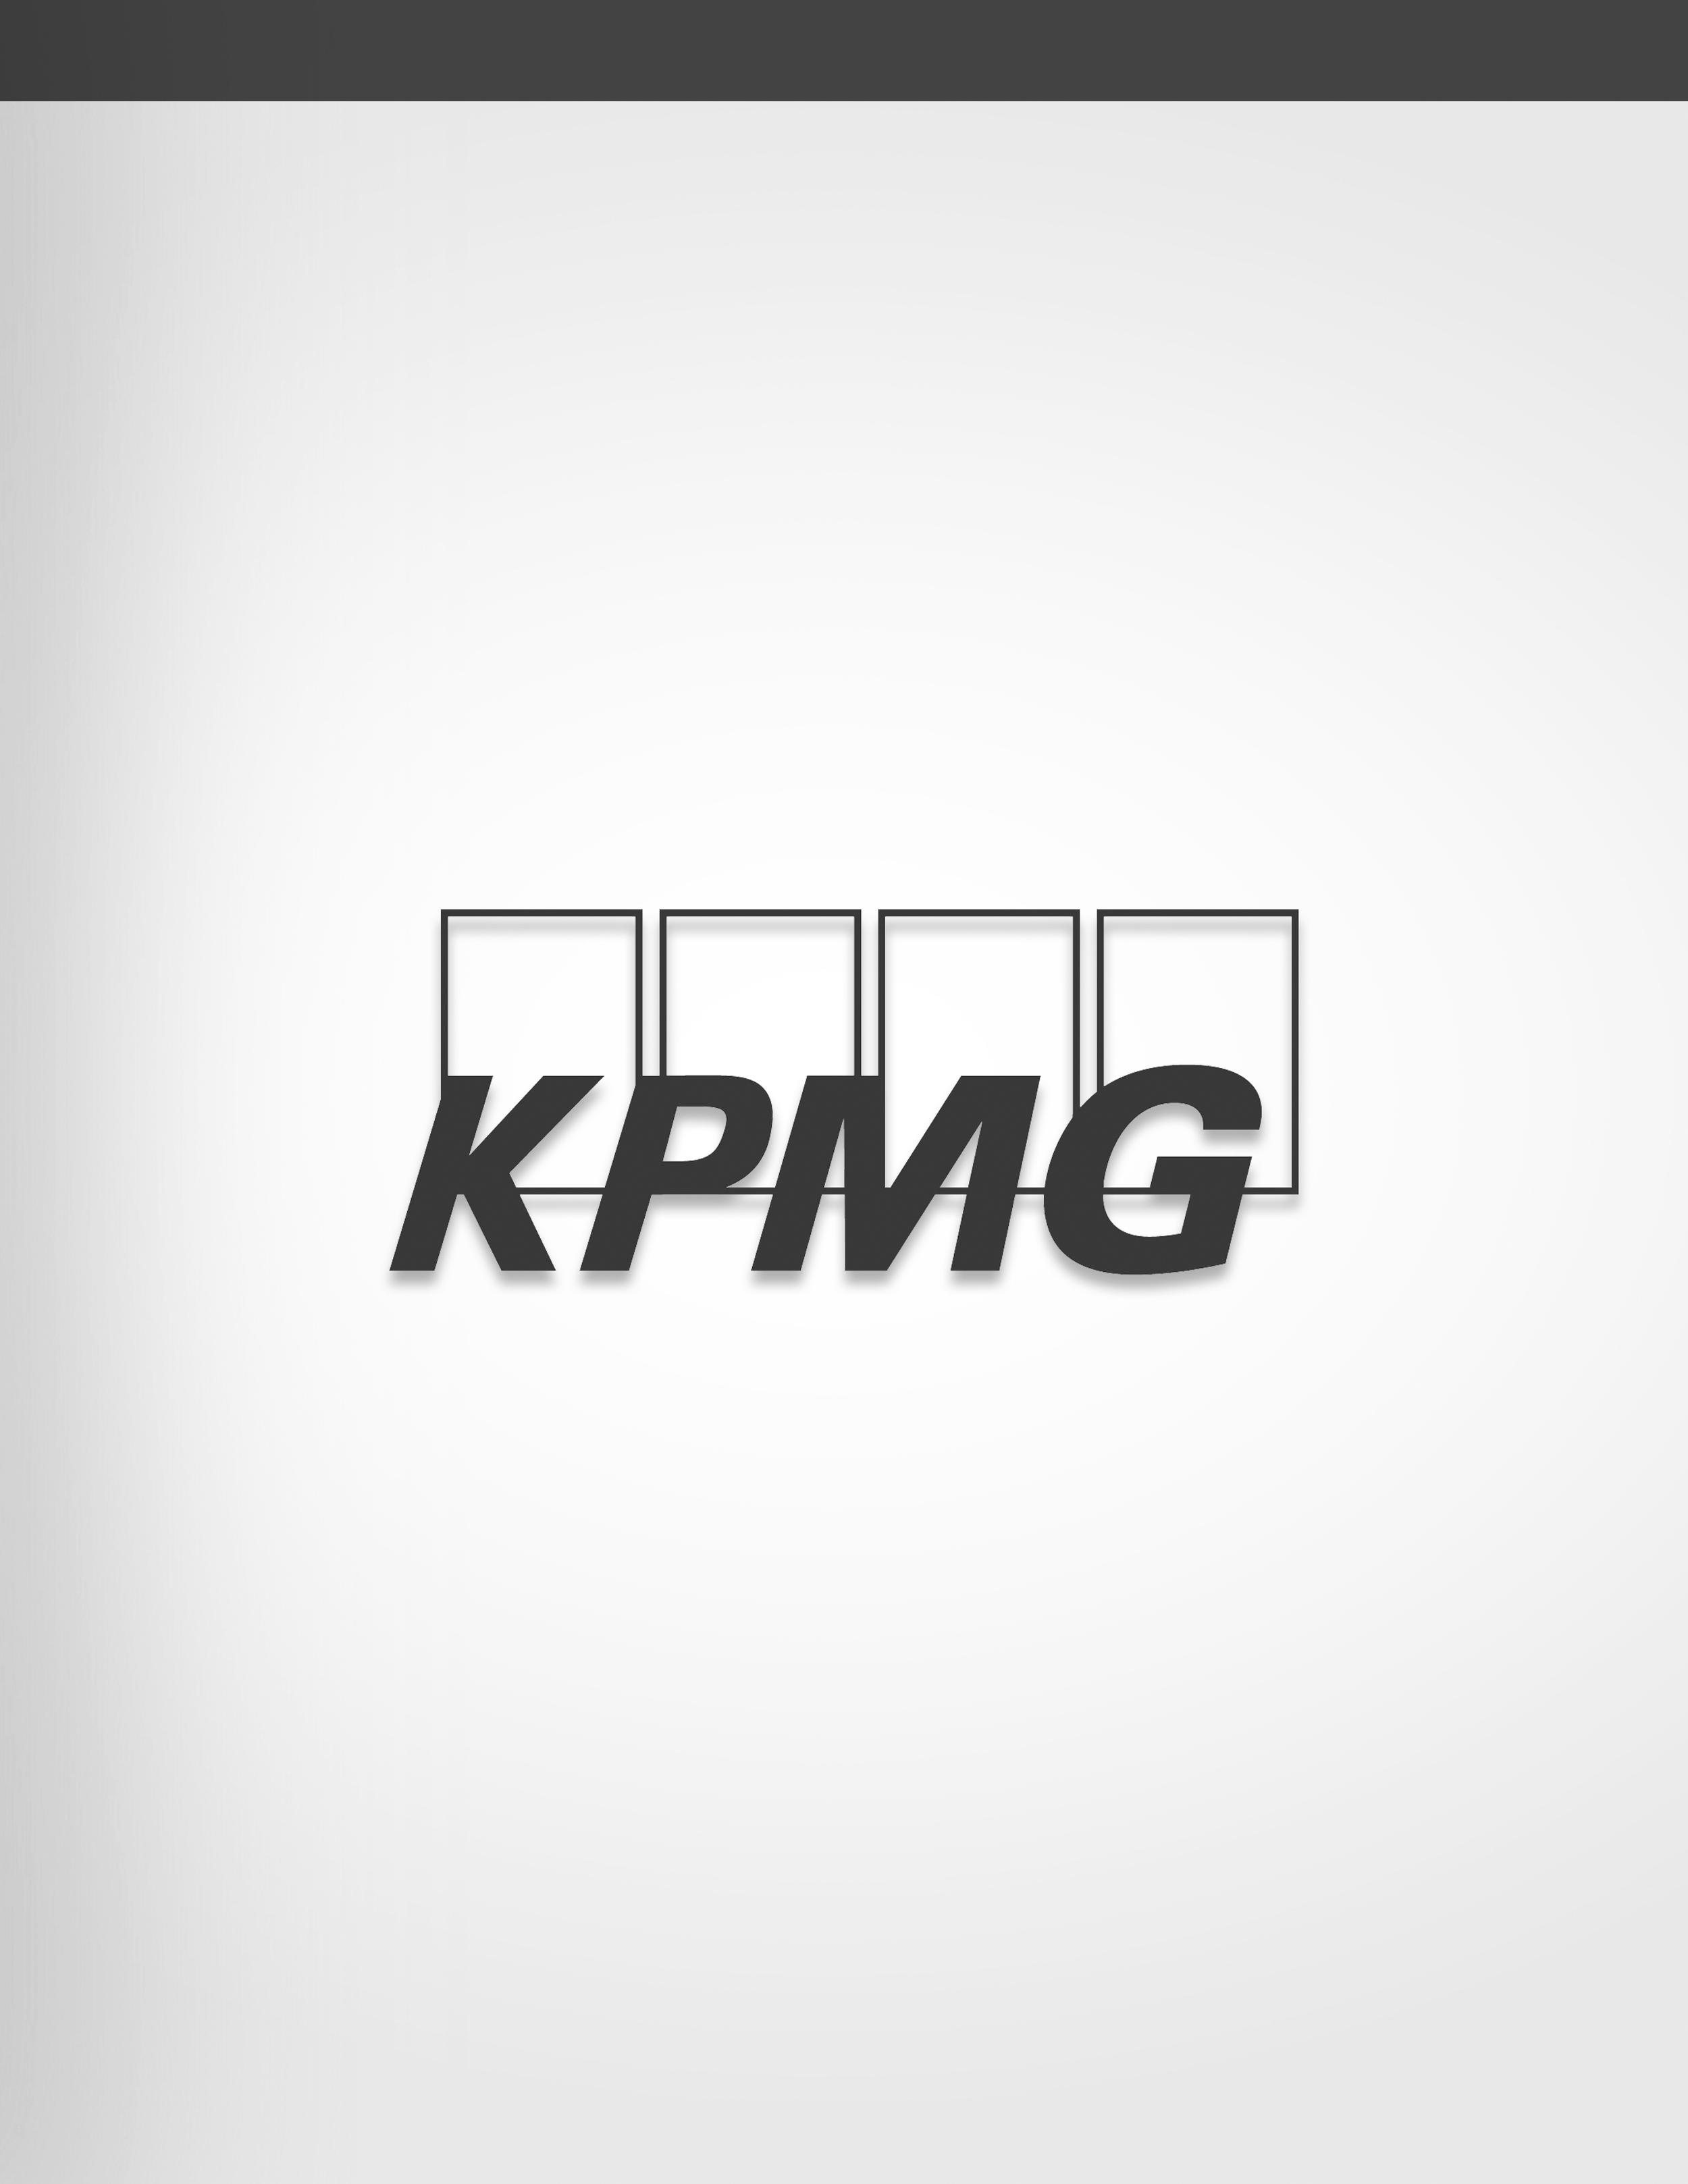 M&A Predictor  (KPMG)